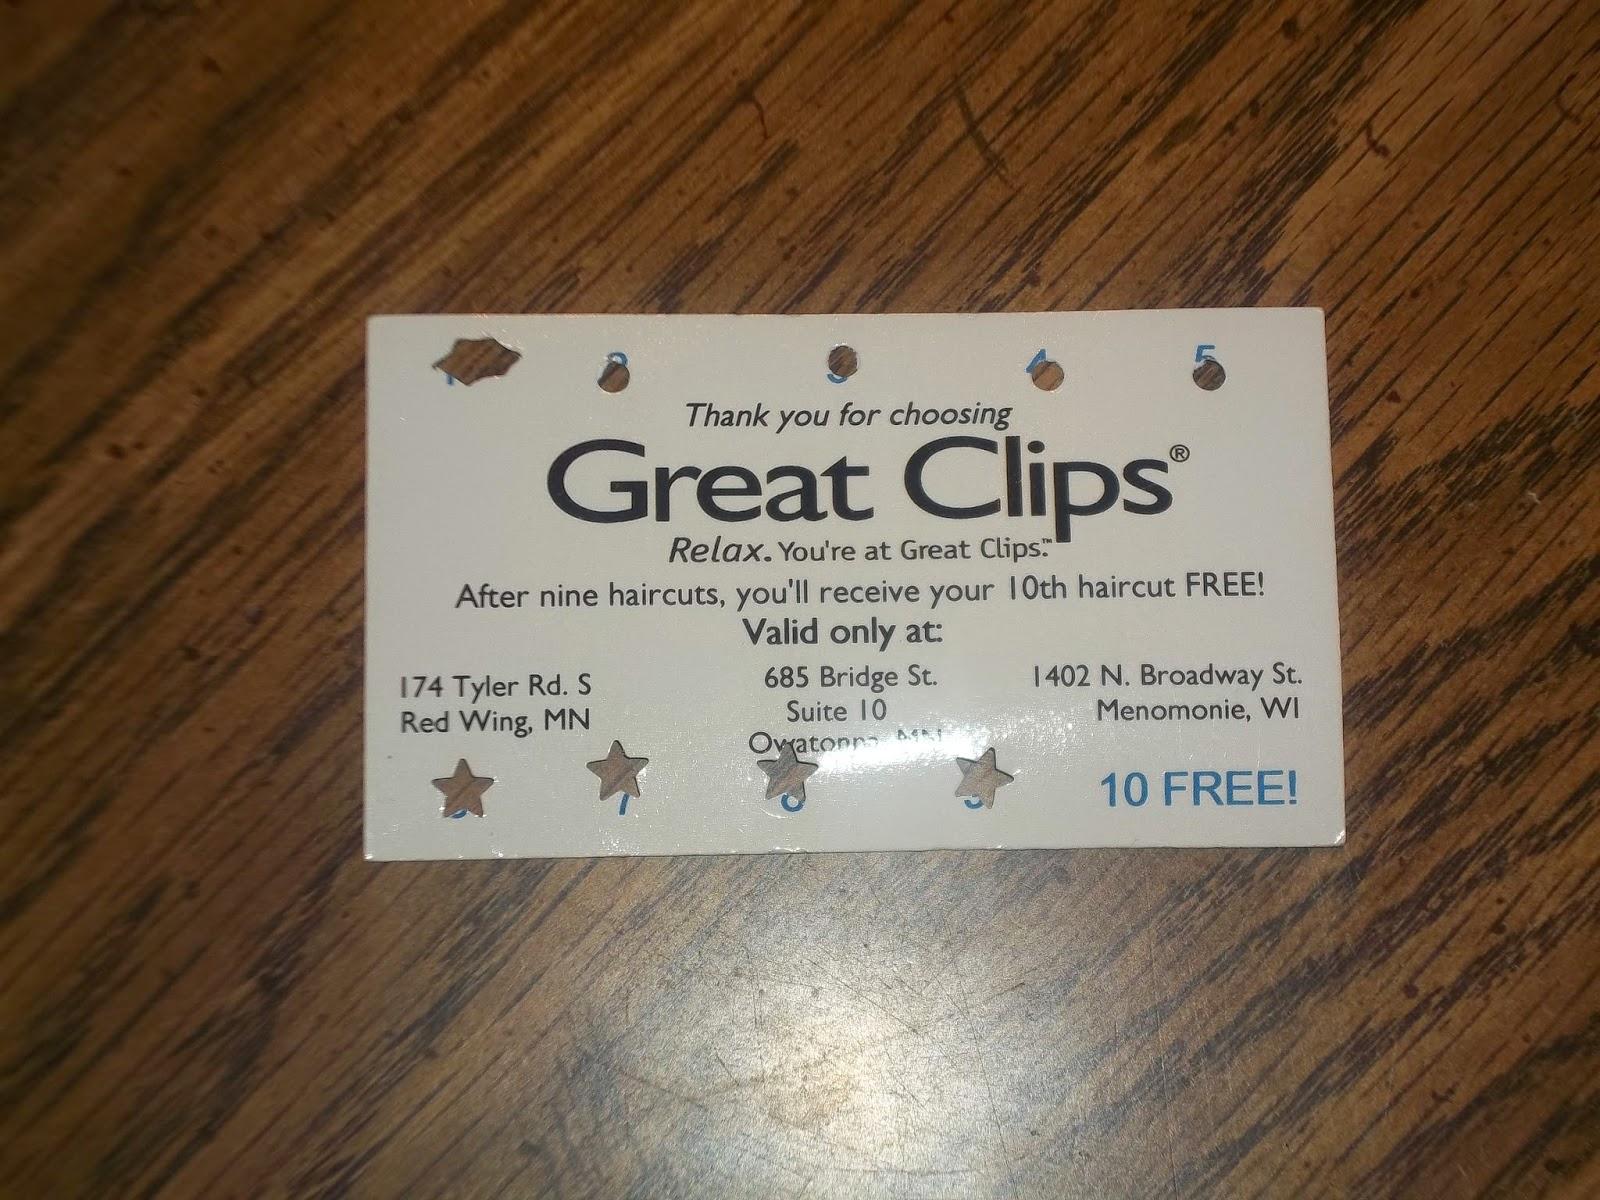 7 2014 Haircut Great Clips 99